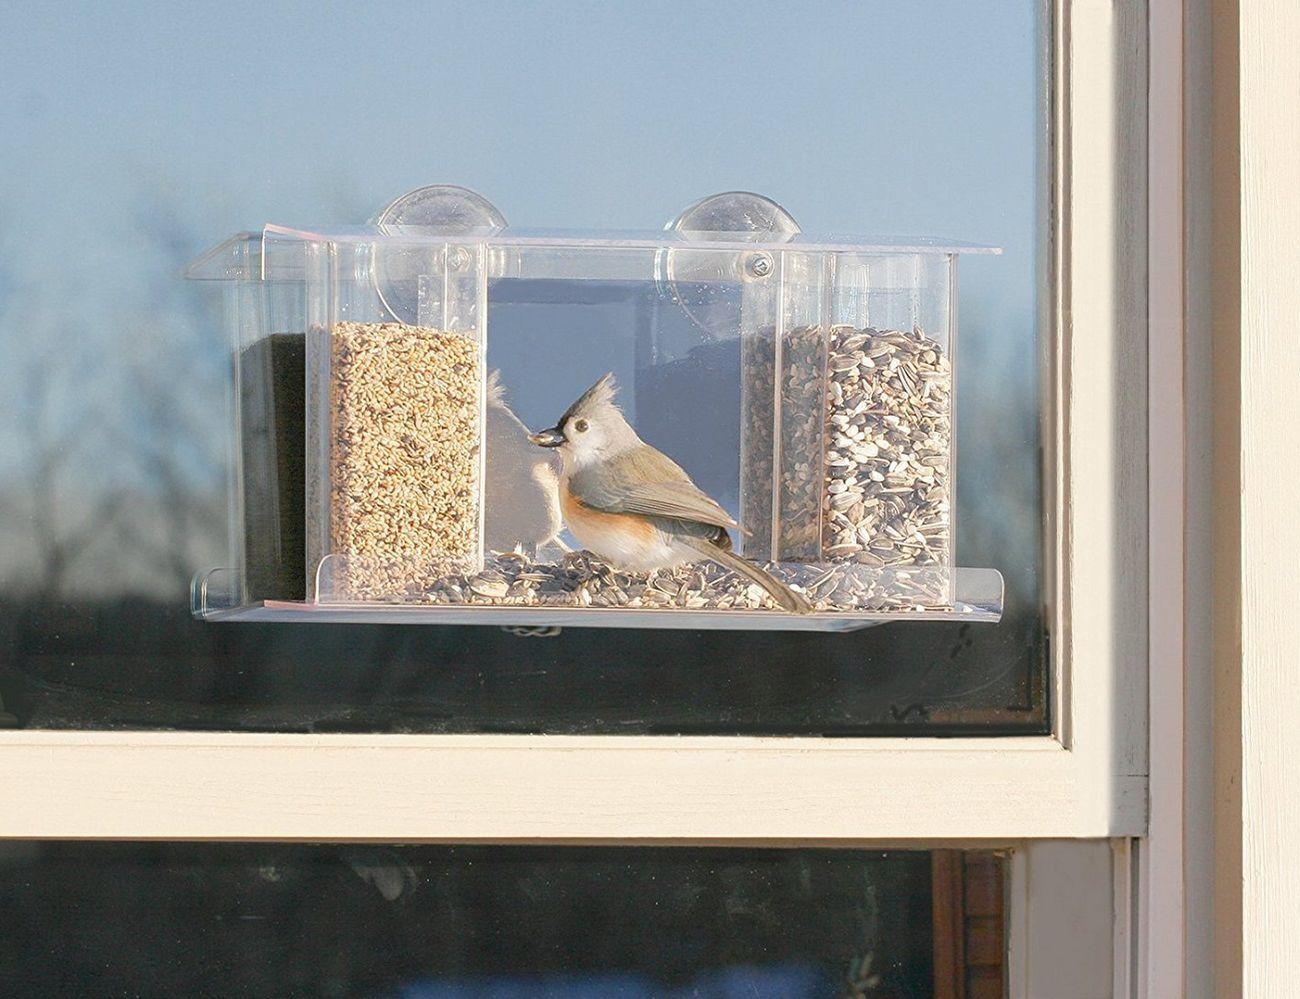 Duncraft One-Way Magic Mirror Window Bird Feeder